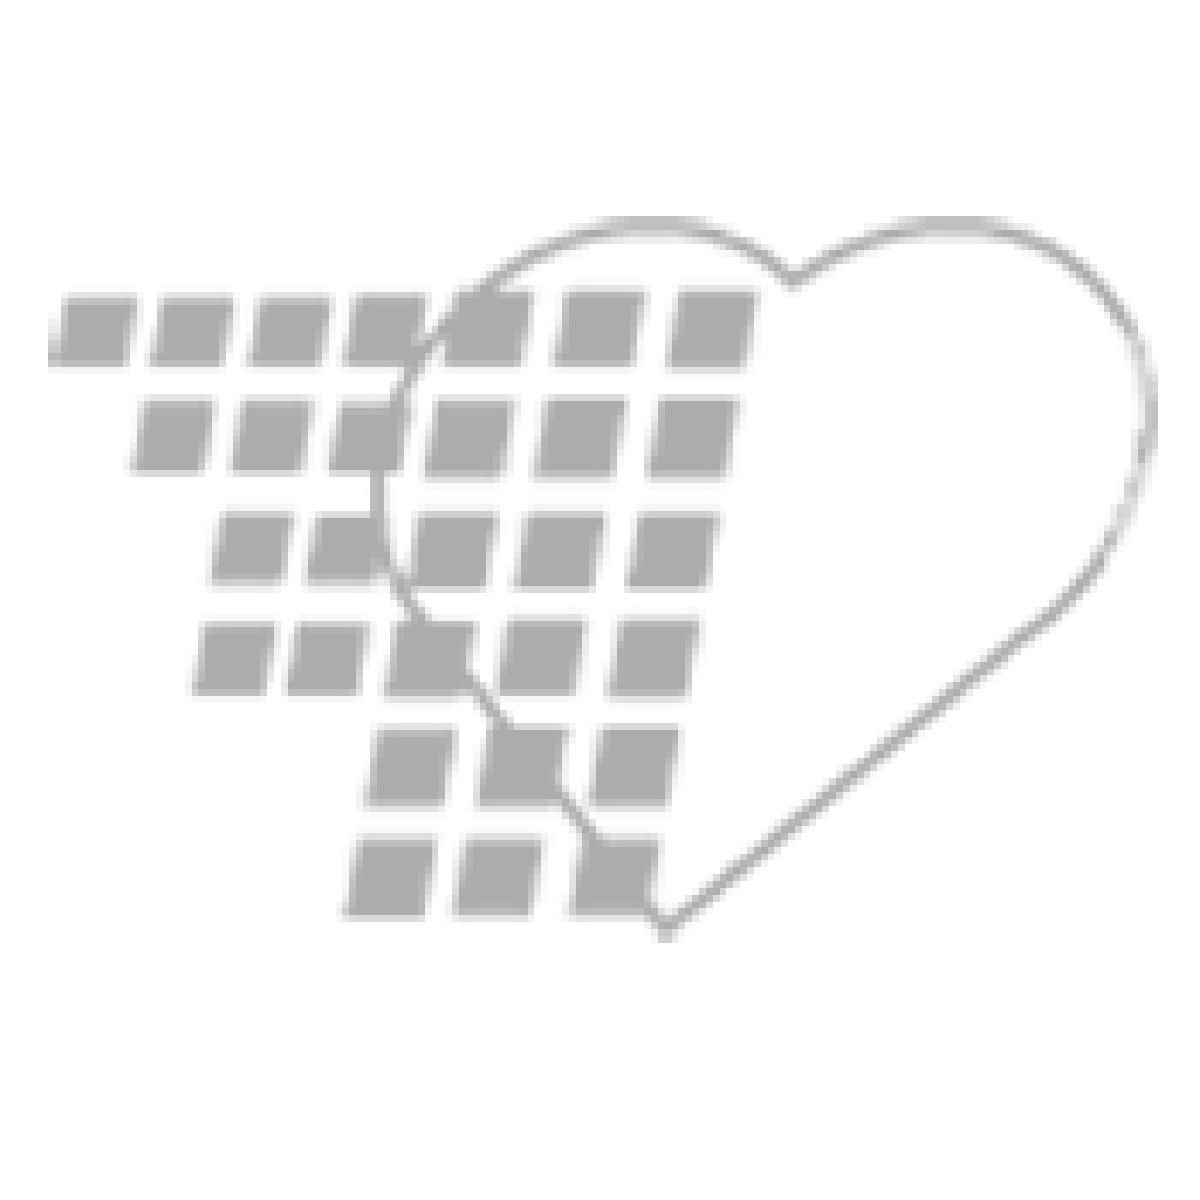 11-81-3250 Laerdal Wound Care Assessment Set Female